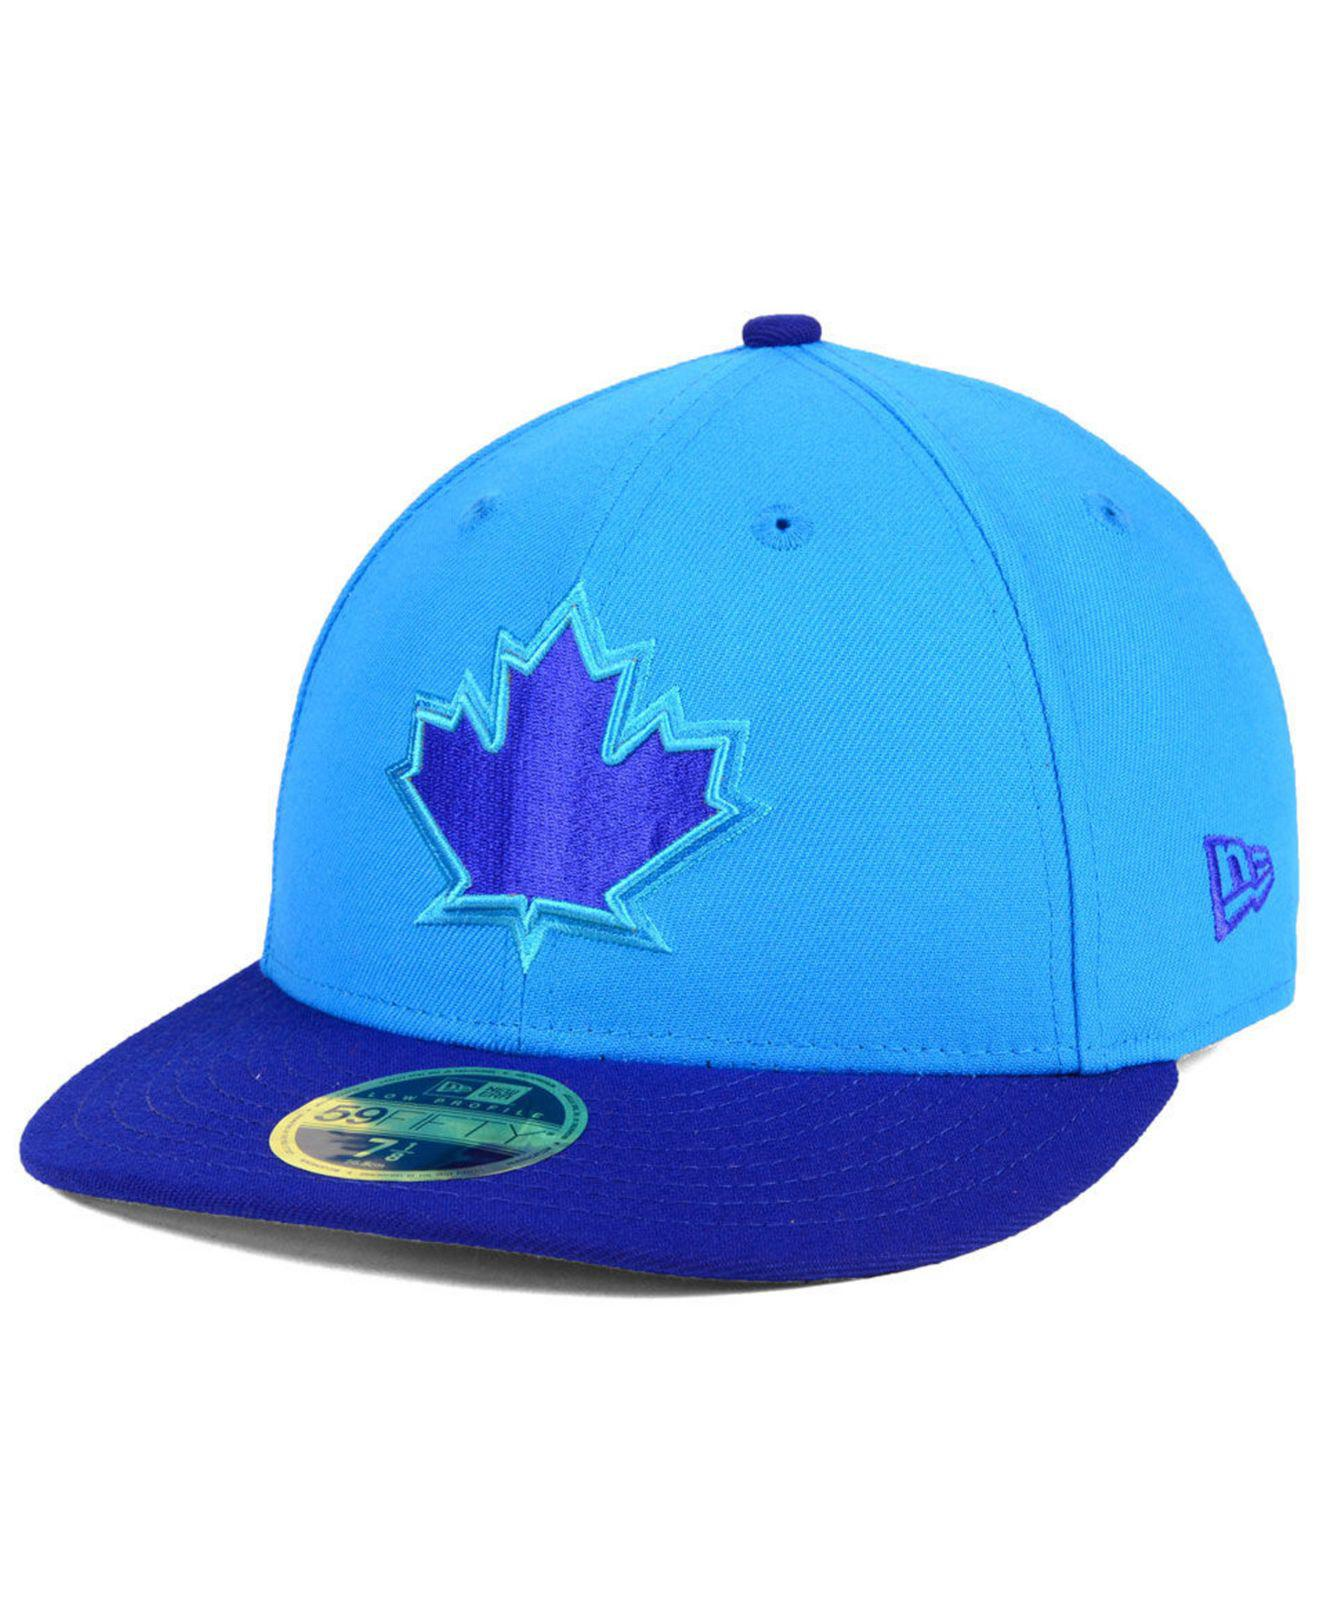 0cb7957b131 Lyst - KTZ Toronto Blue Jays Players Weekend Low Profile 59fifty ...